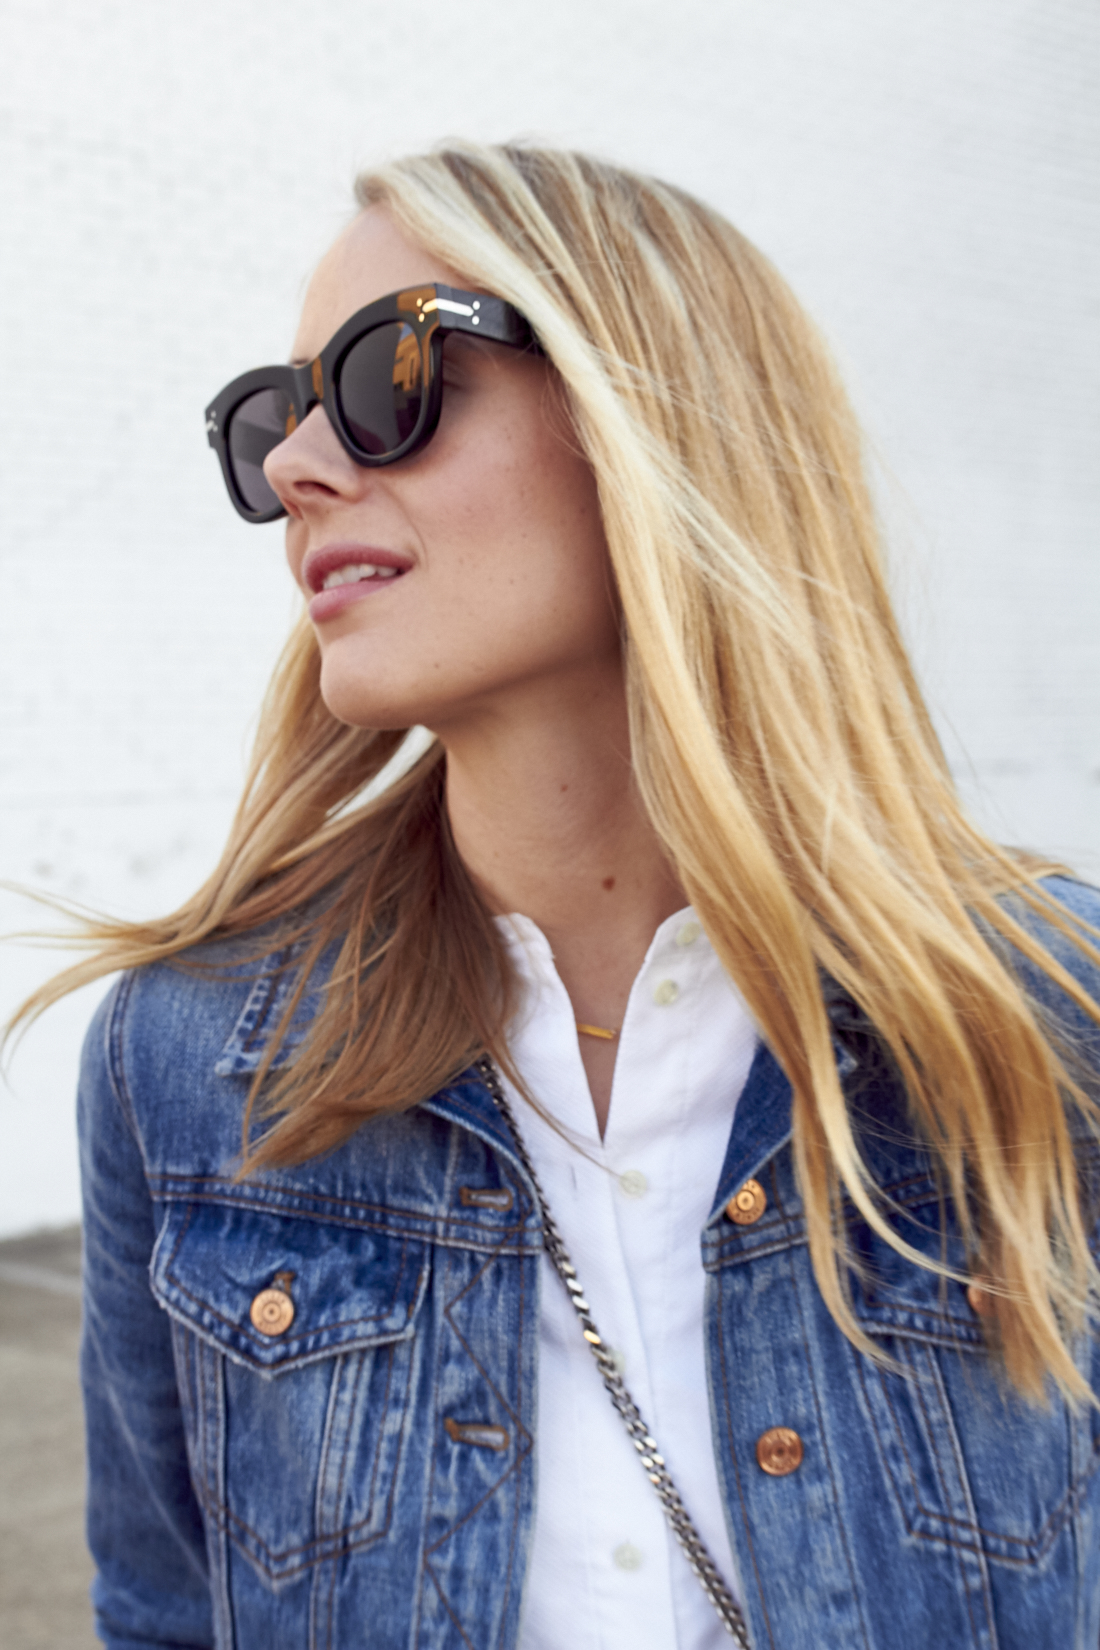 fashion-jackson-celine-sunglasses-denim-jacket